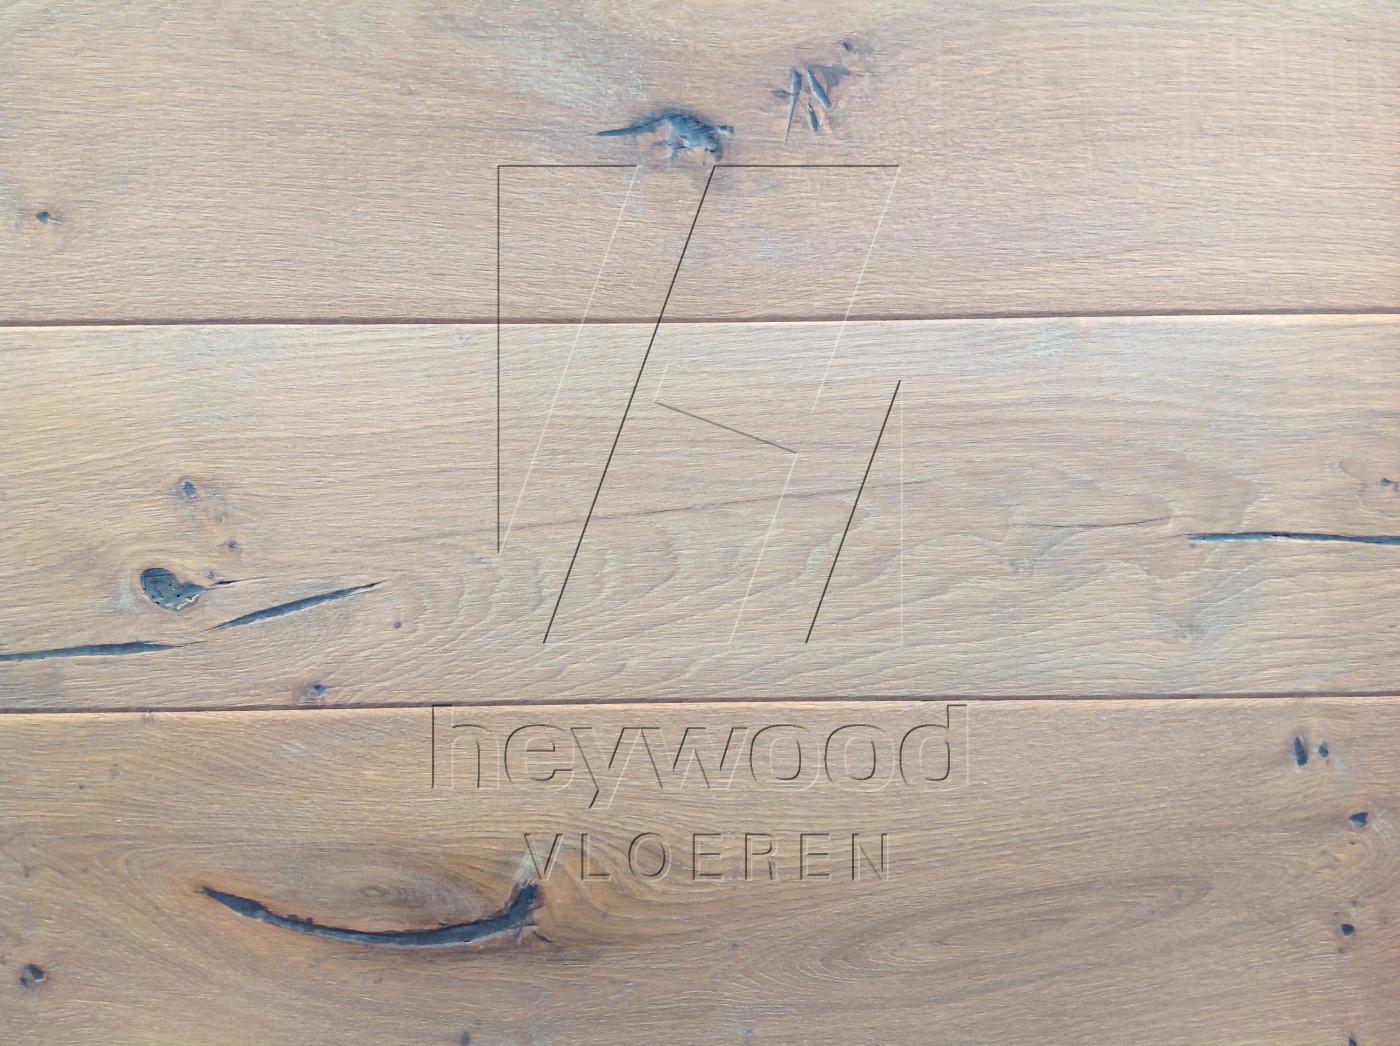 Vanoise in Aged Shrunk surface of Aged Hardwood Floors